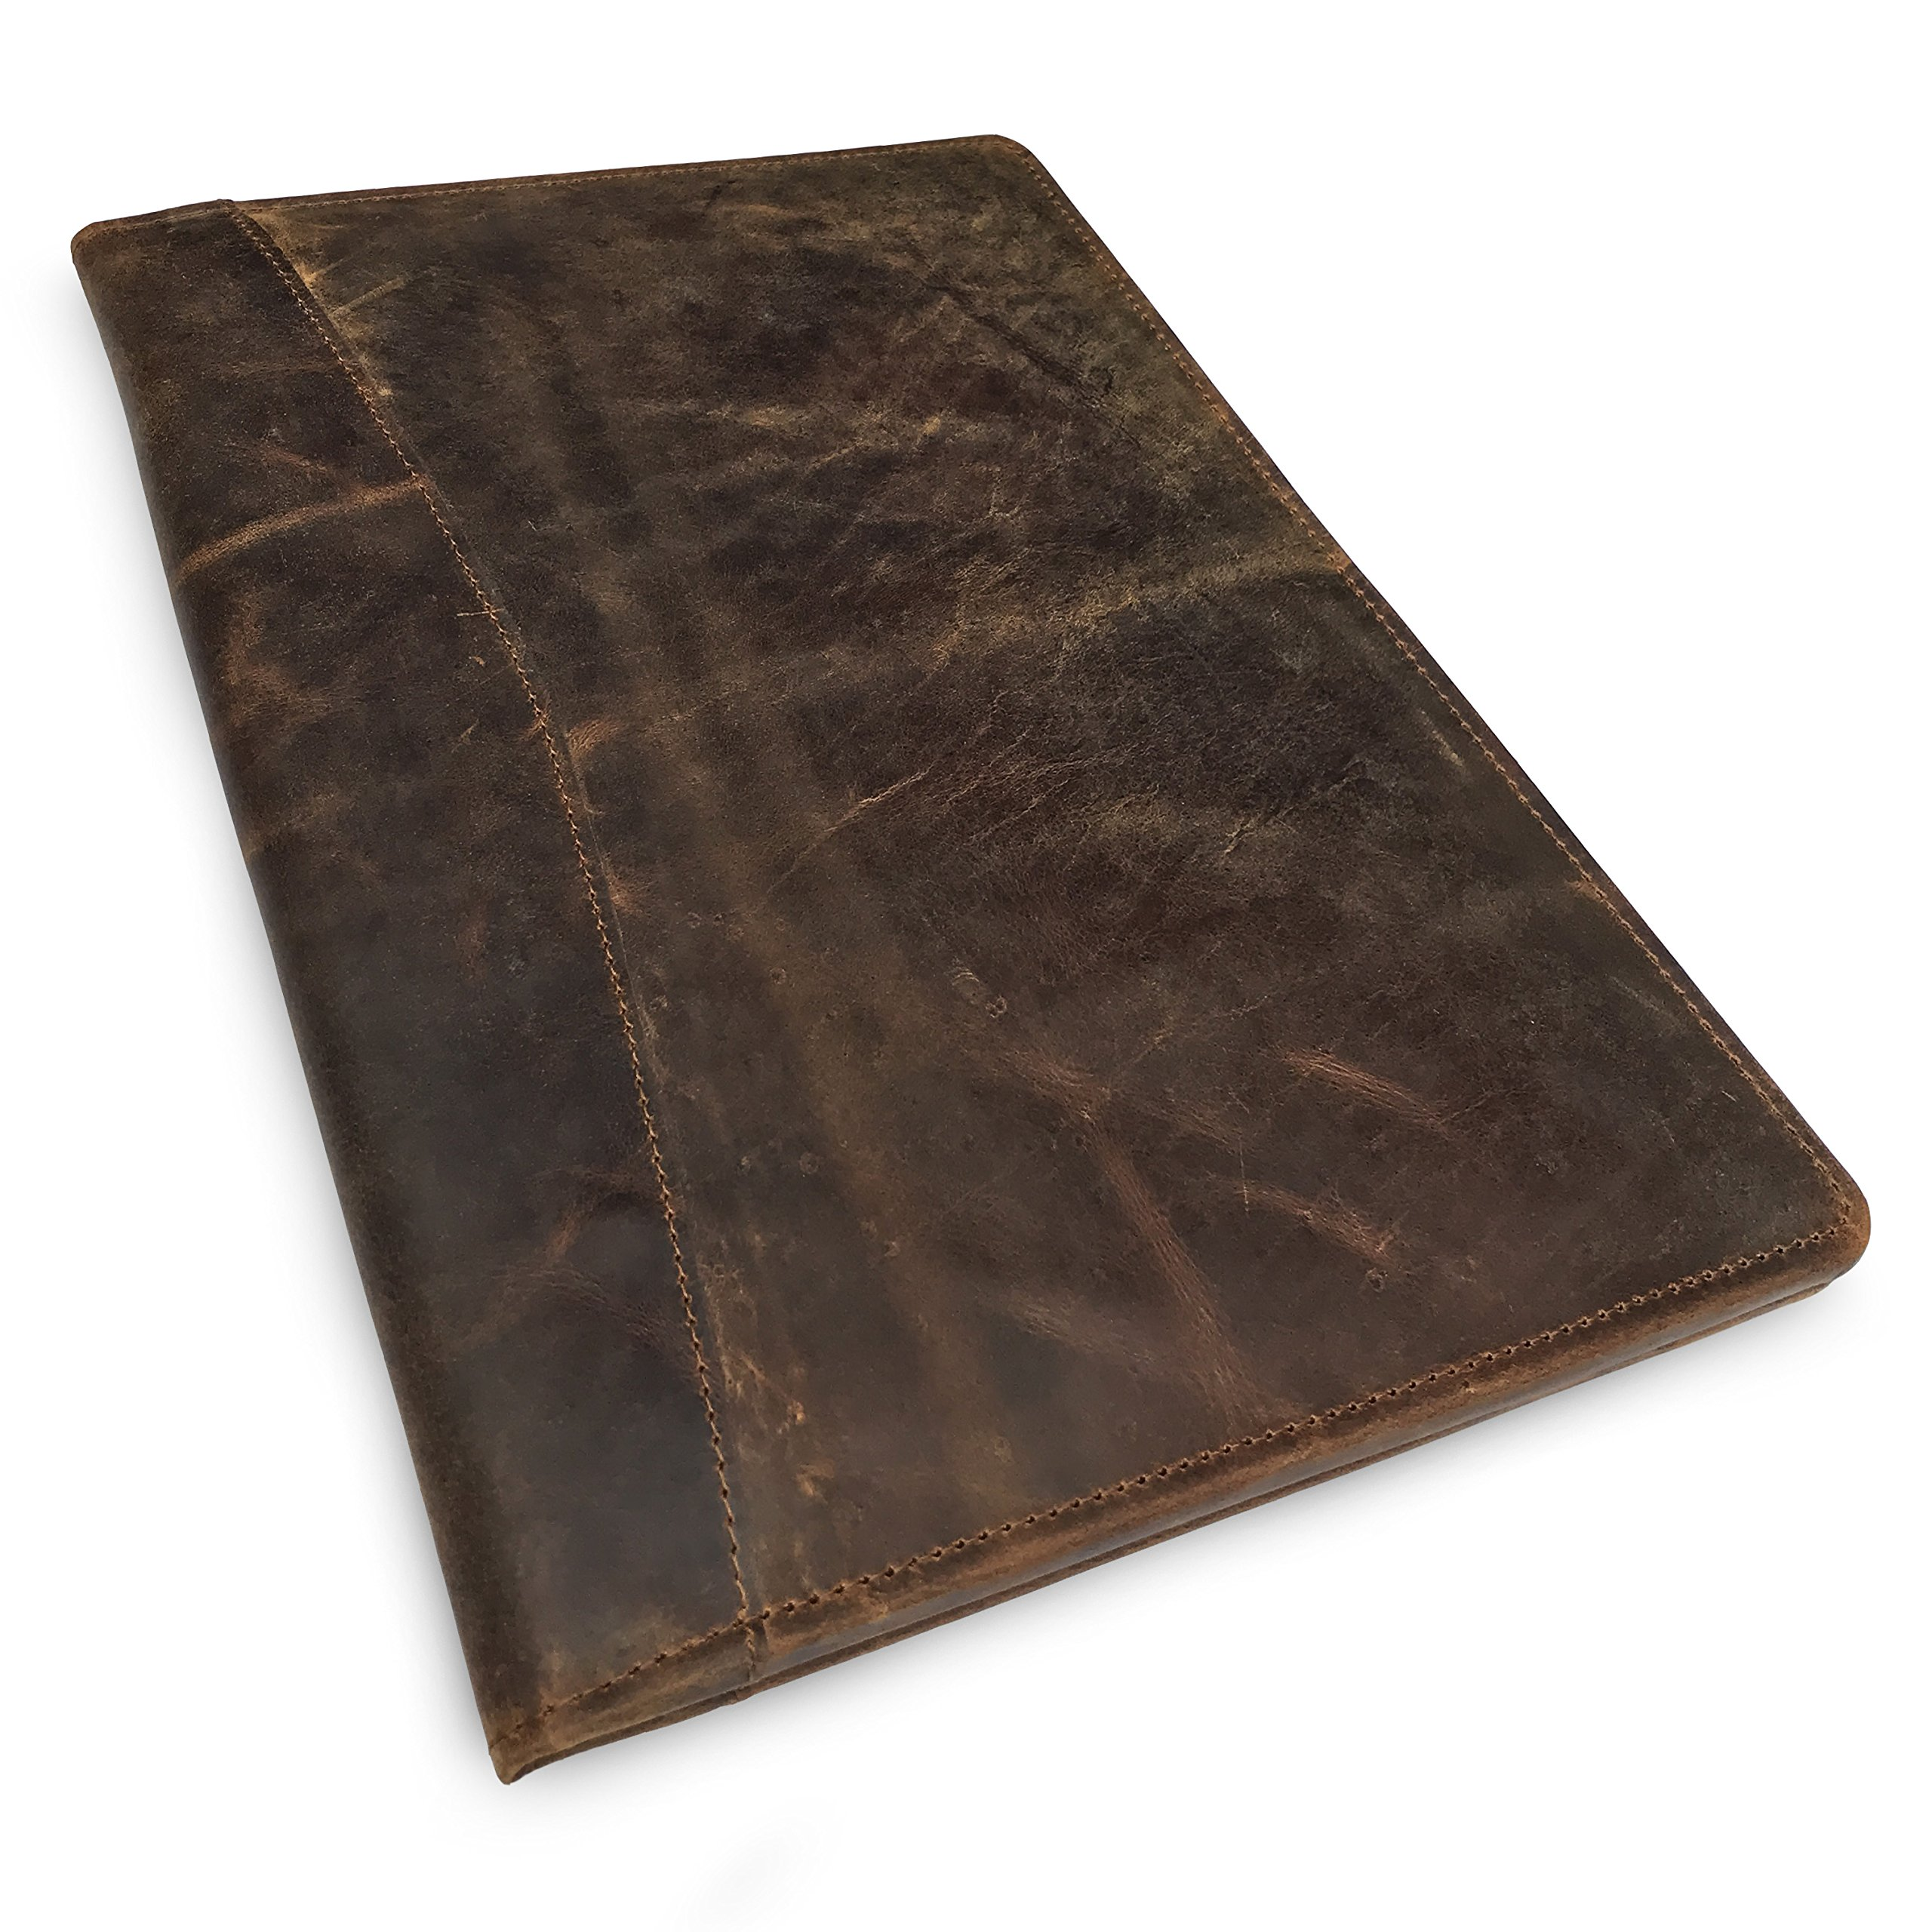 Leather Portfolio Professional Resume Padfolio - Document Folder & Organizer Folio for Letter-Size & A4 Writing Pad with Business Card Holder, Ideal Gift Portfolios for Men + Women (Dark Brown)